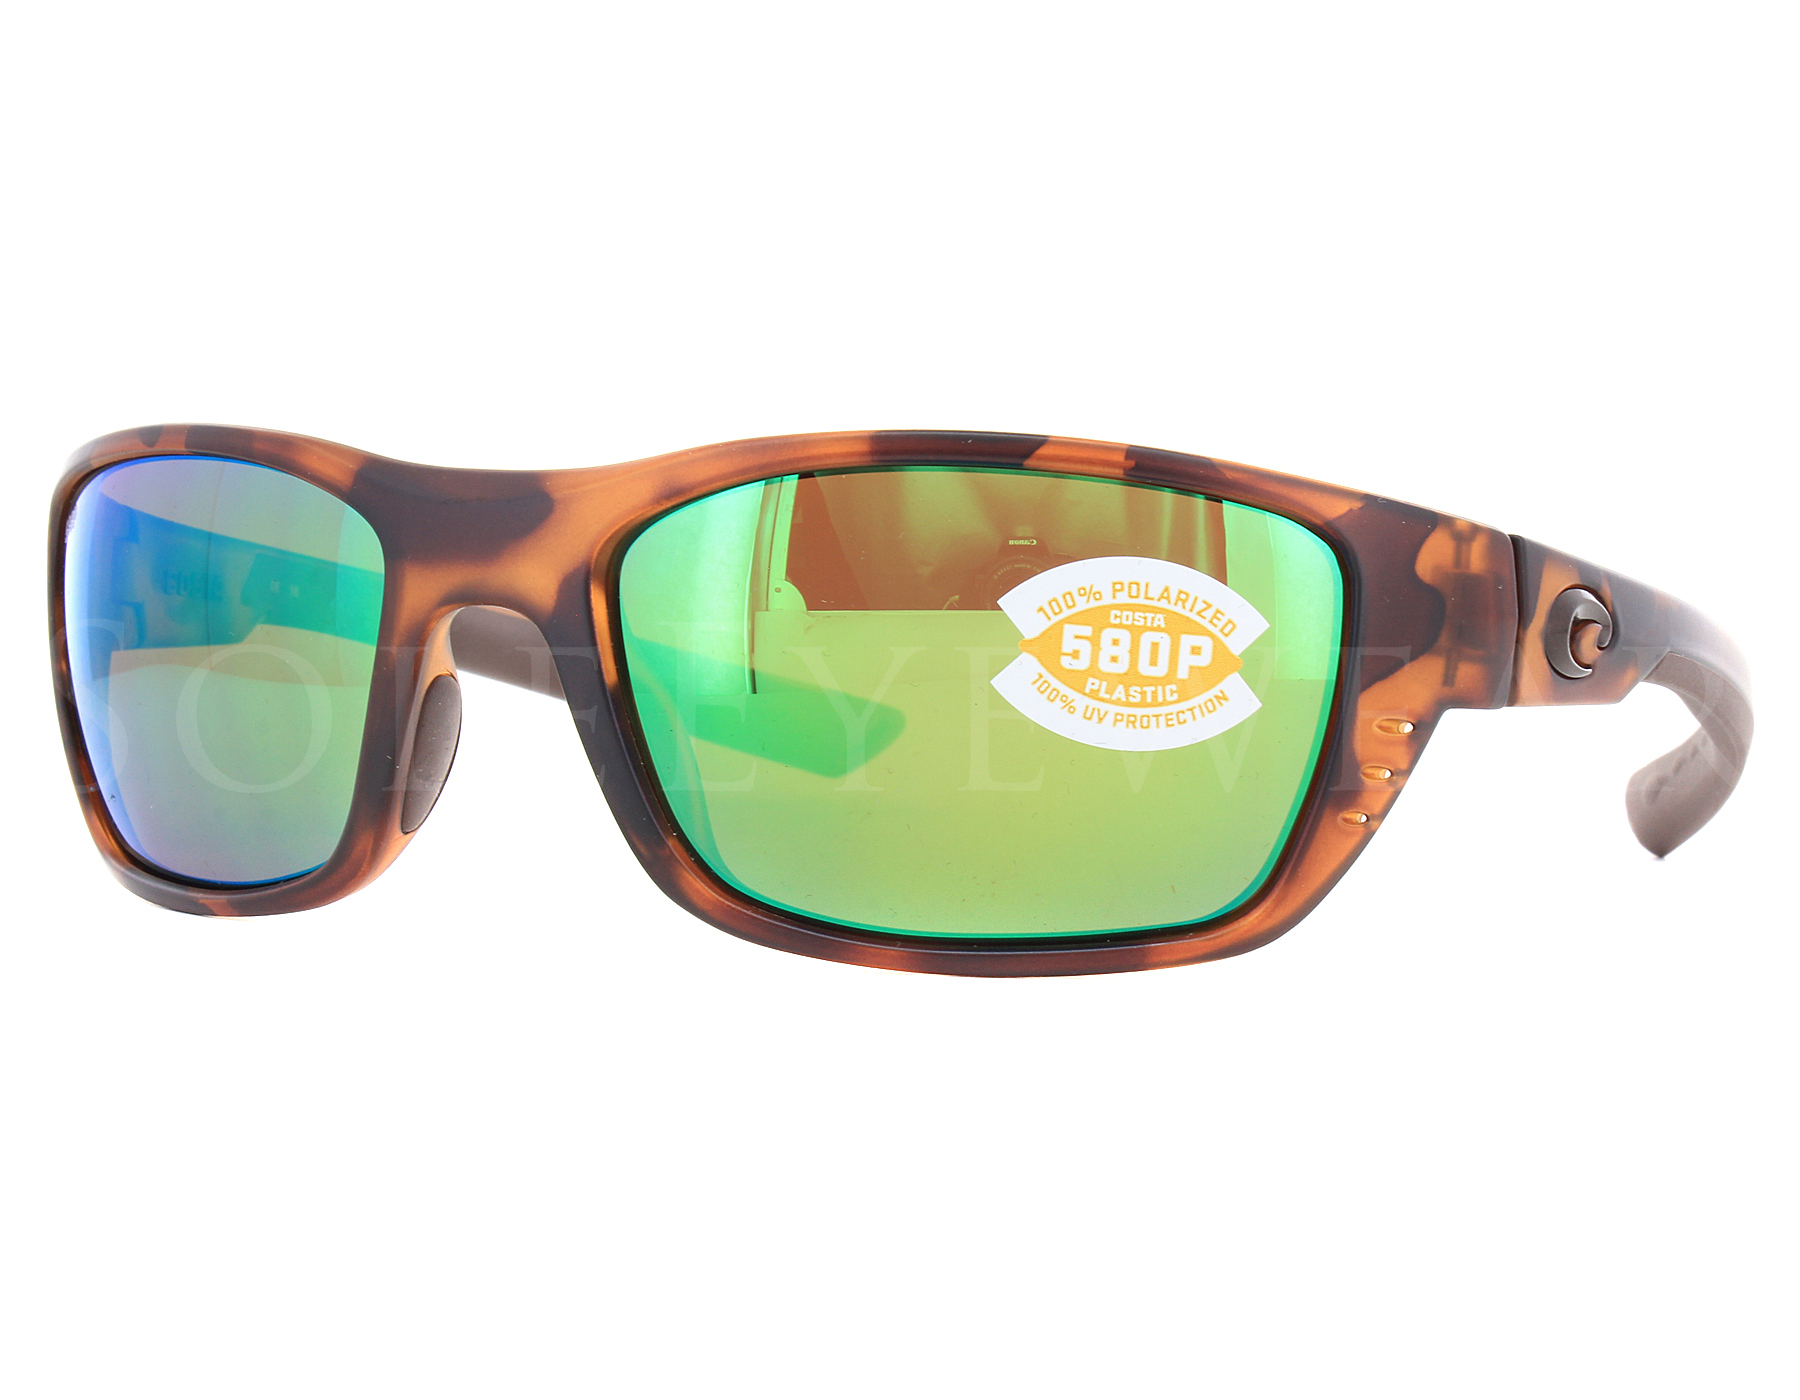 adce0c3d4b Details about NEW Costa Del Mar Whitetip Matte Retro Tortoise Green  WTP66-OGMP580P Sunglasses